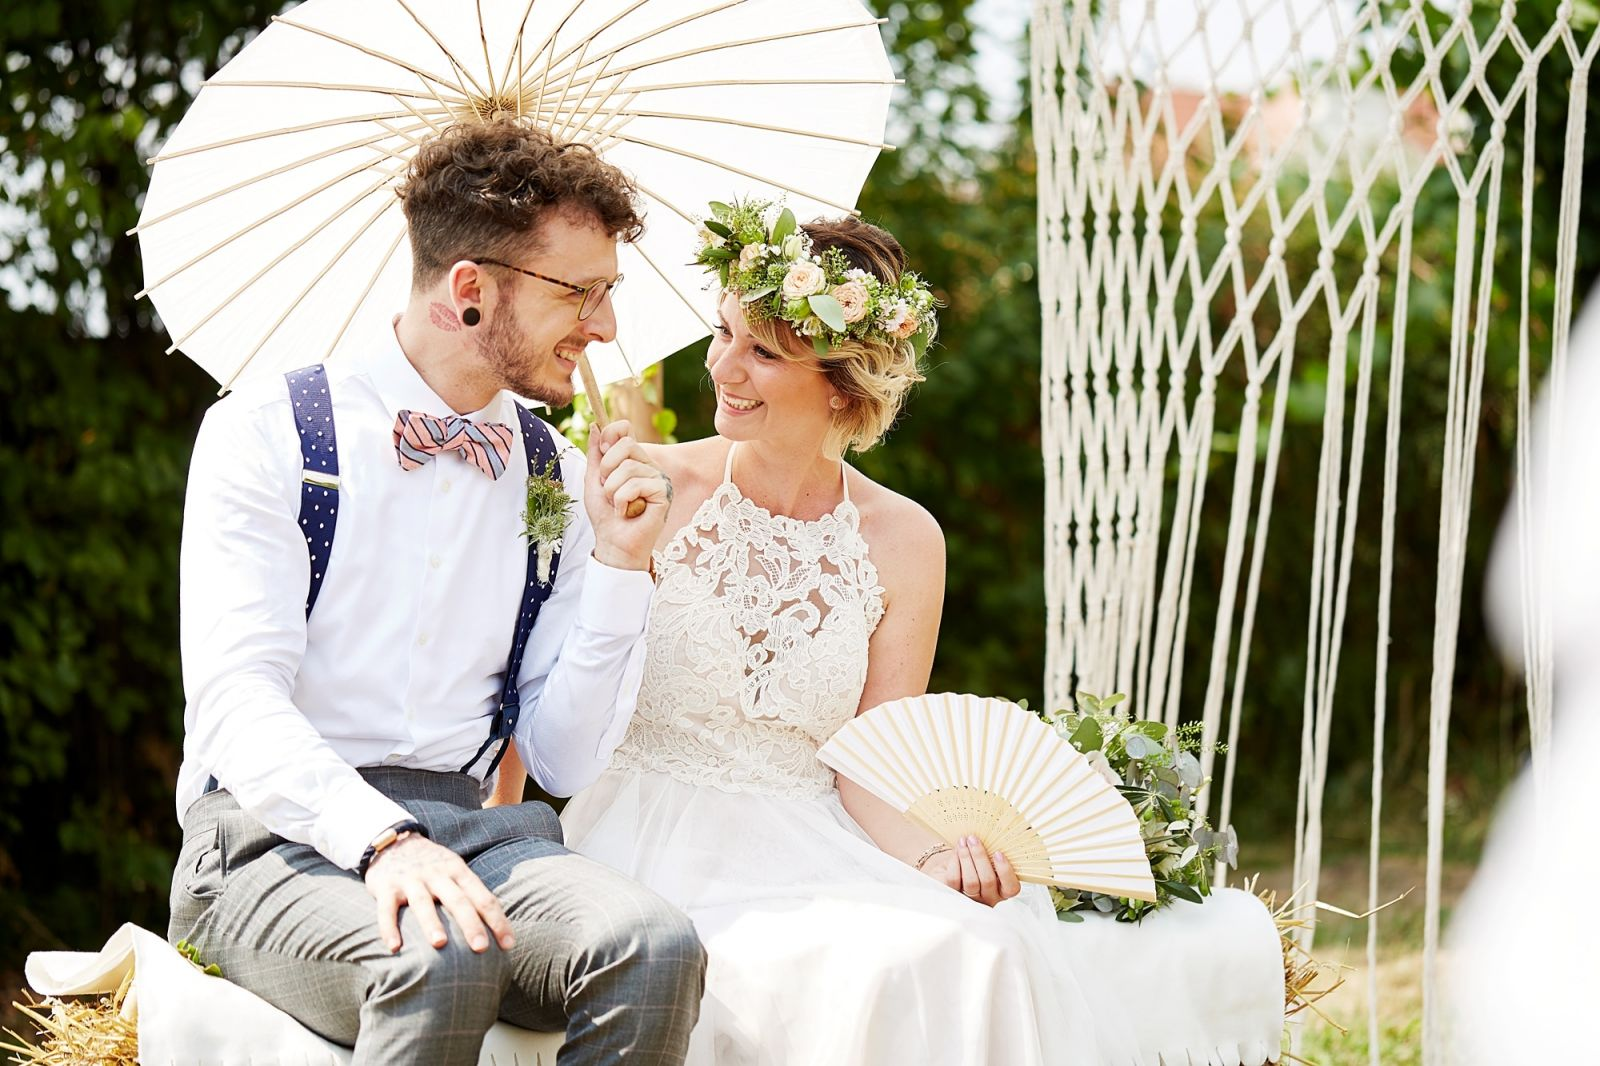 Brautpaar lacht sich verliebt unter Sonnenschirm an